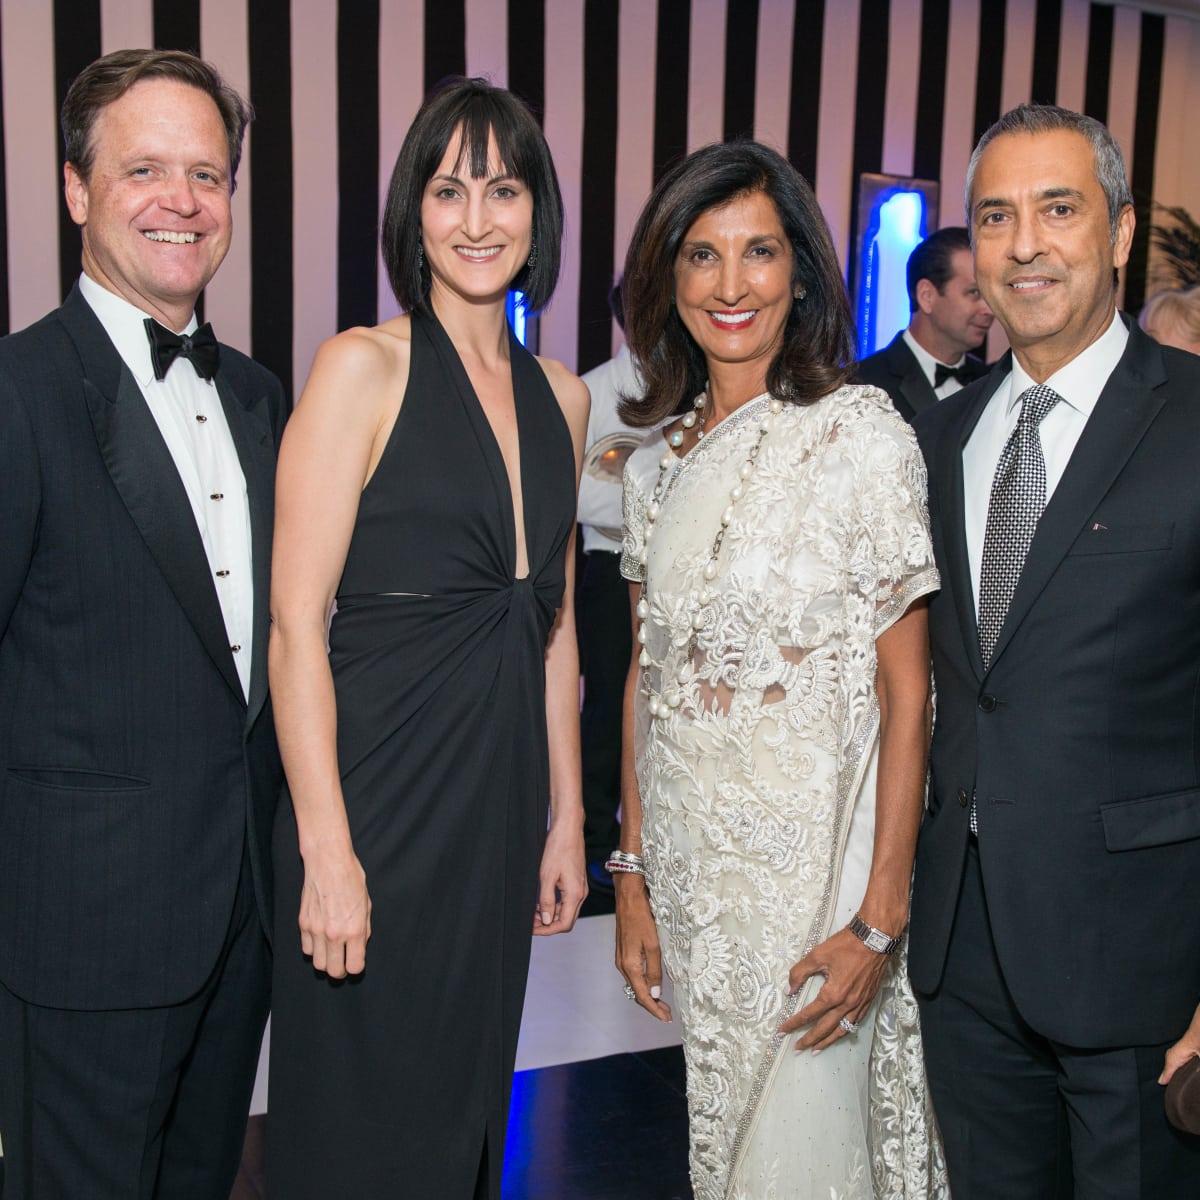 News, Shelby, Museum of Fine Arts gala, Oct. 2015,Christopher Gardner, Emily Church, Sultana & Moez Mangalji